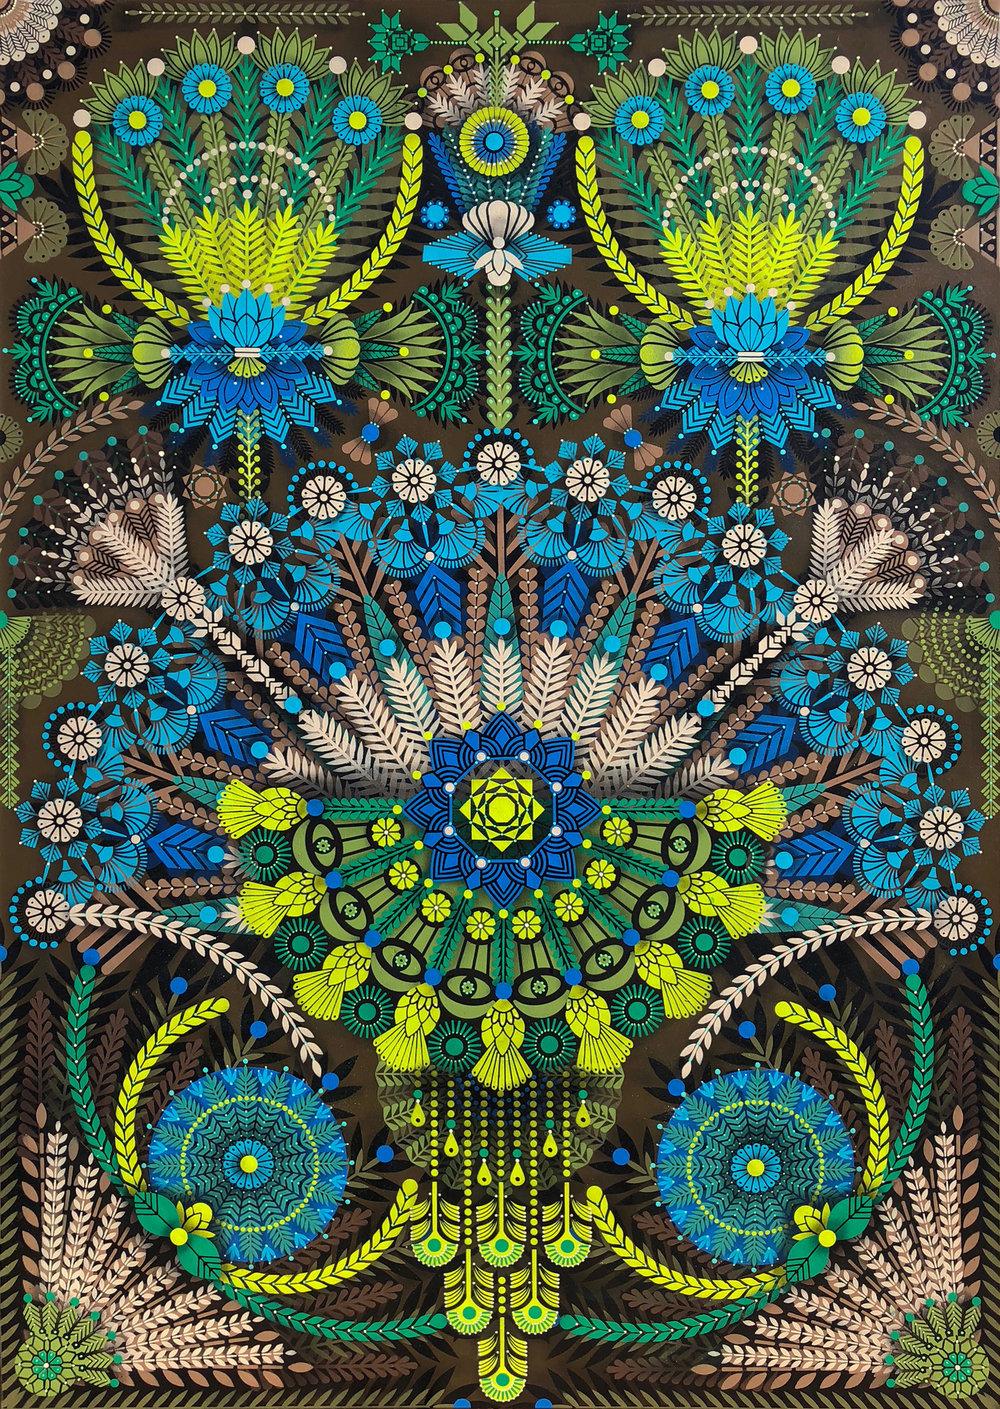 Kaleidoscopic Nature #3  - Acrylic on canvas, 162 x 114 cm   2018